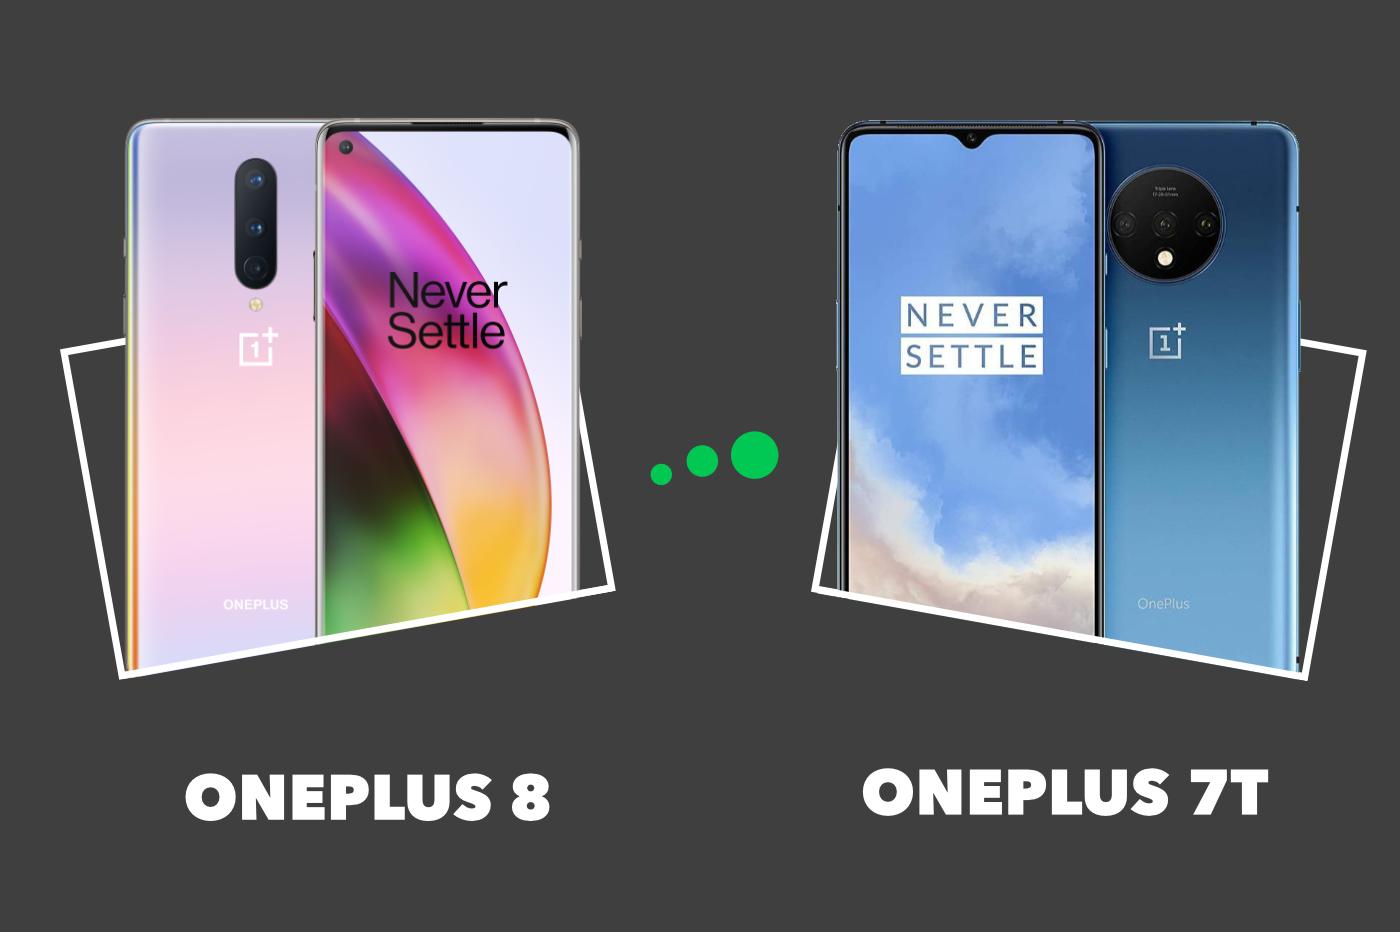 OnePlus 8 vs OnePlus 7T